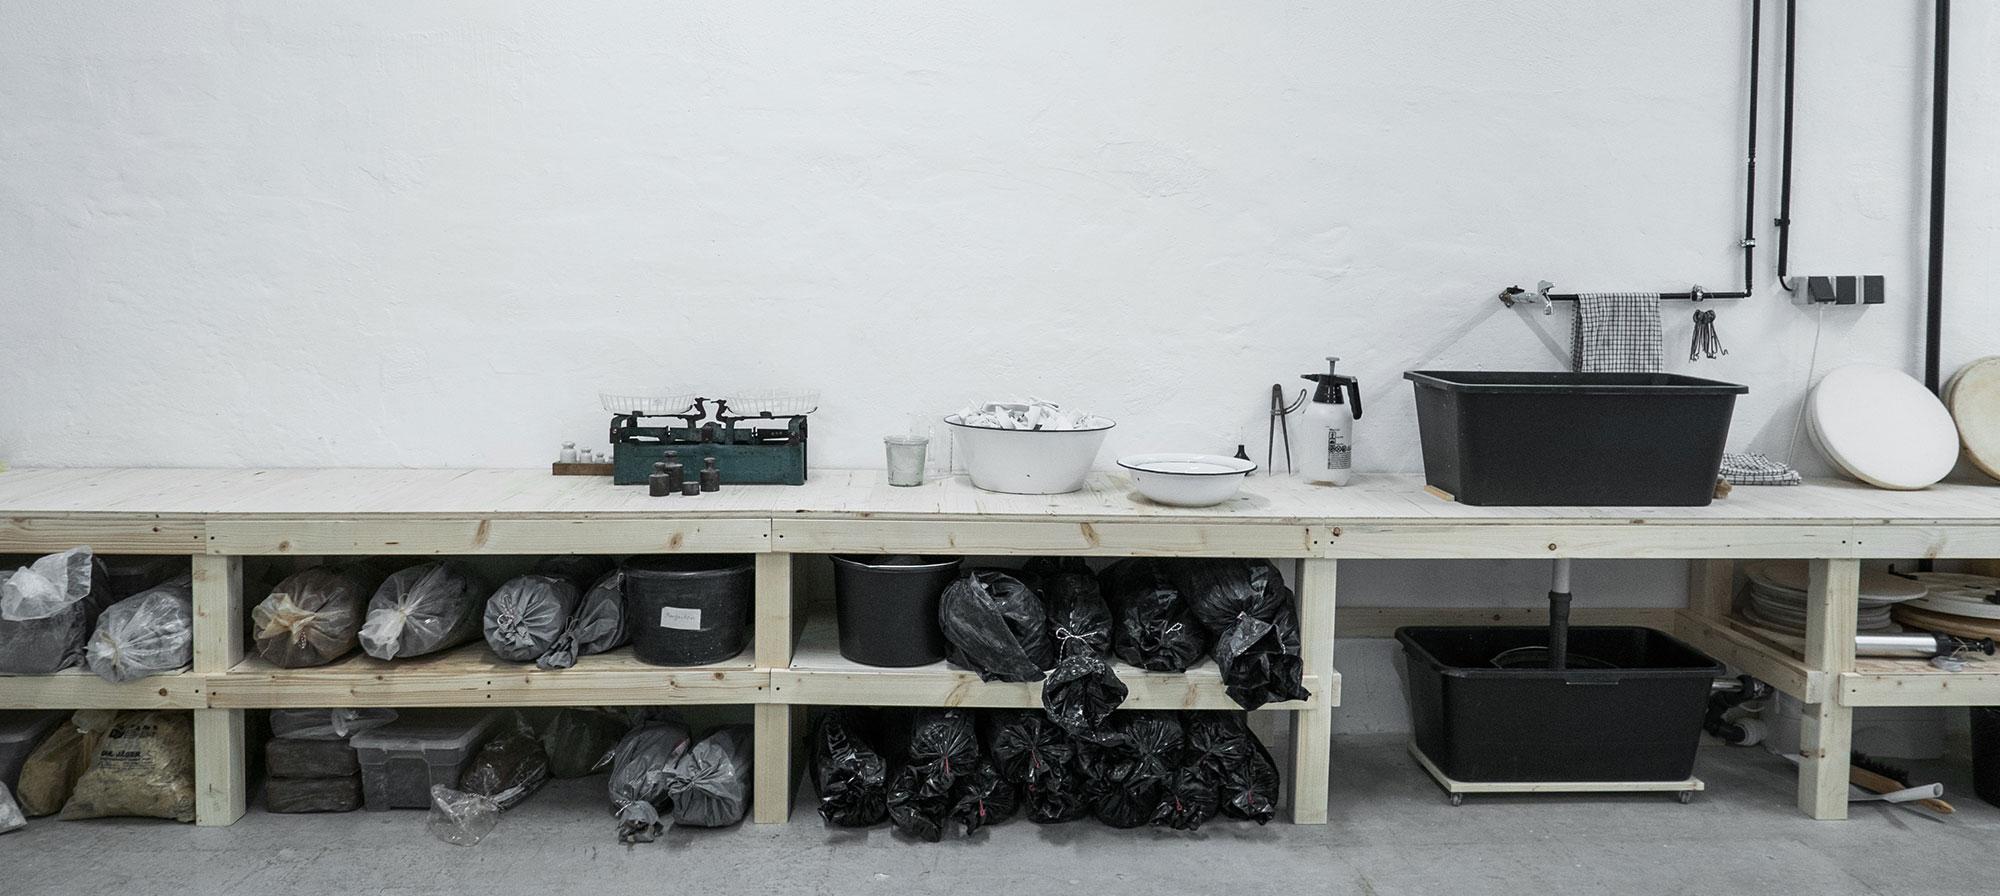 Yvette Hoffmann Design Workshop